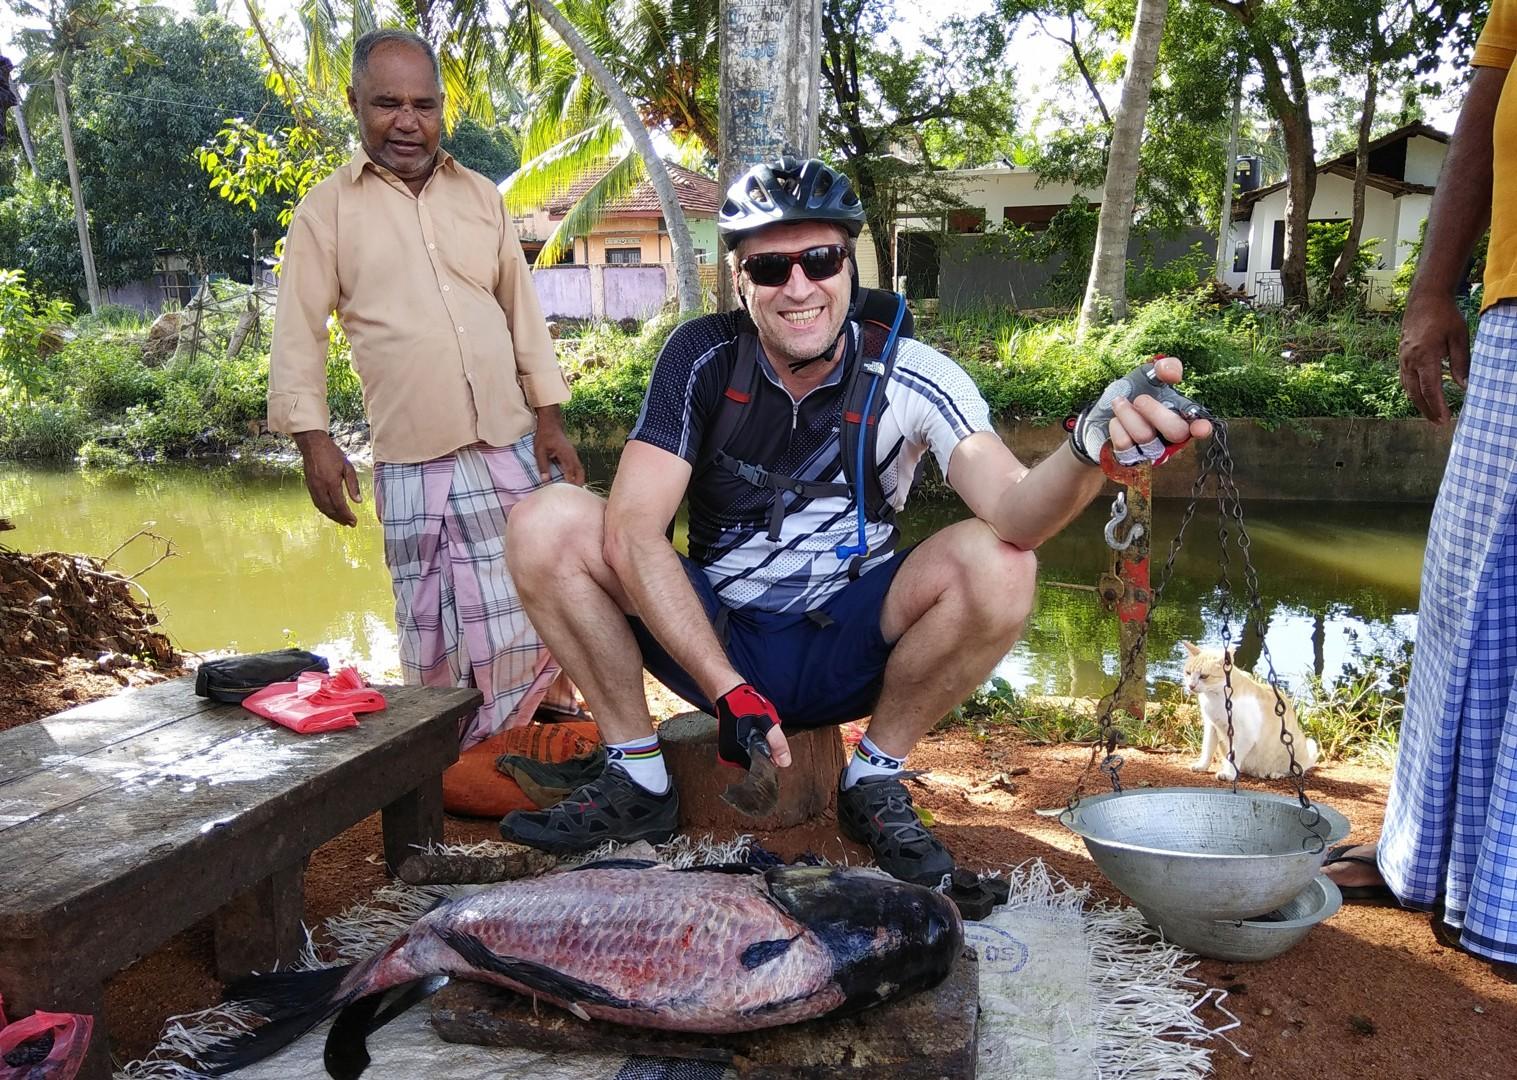 authentic-local-experience-cycling-adventure-sri-lanka.jpg - Sri Lanka - Backroads and Beaches - Cycling Adventures